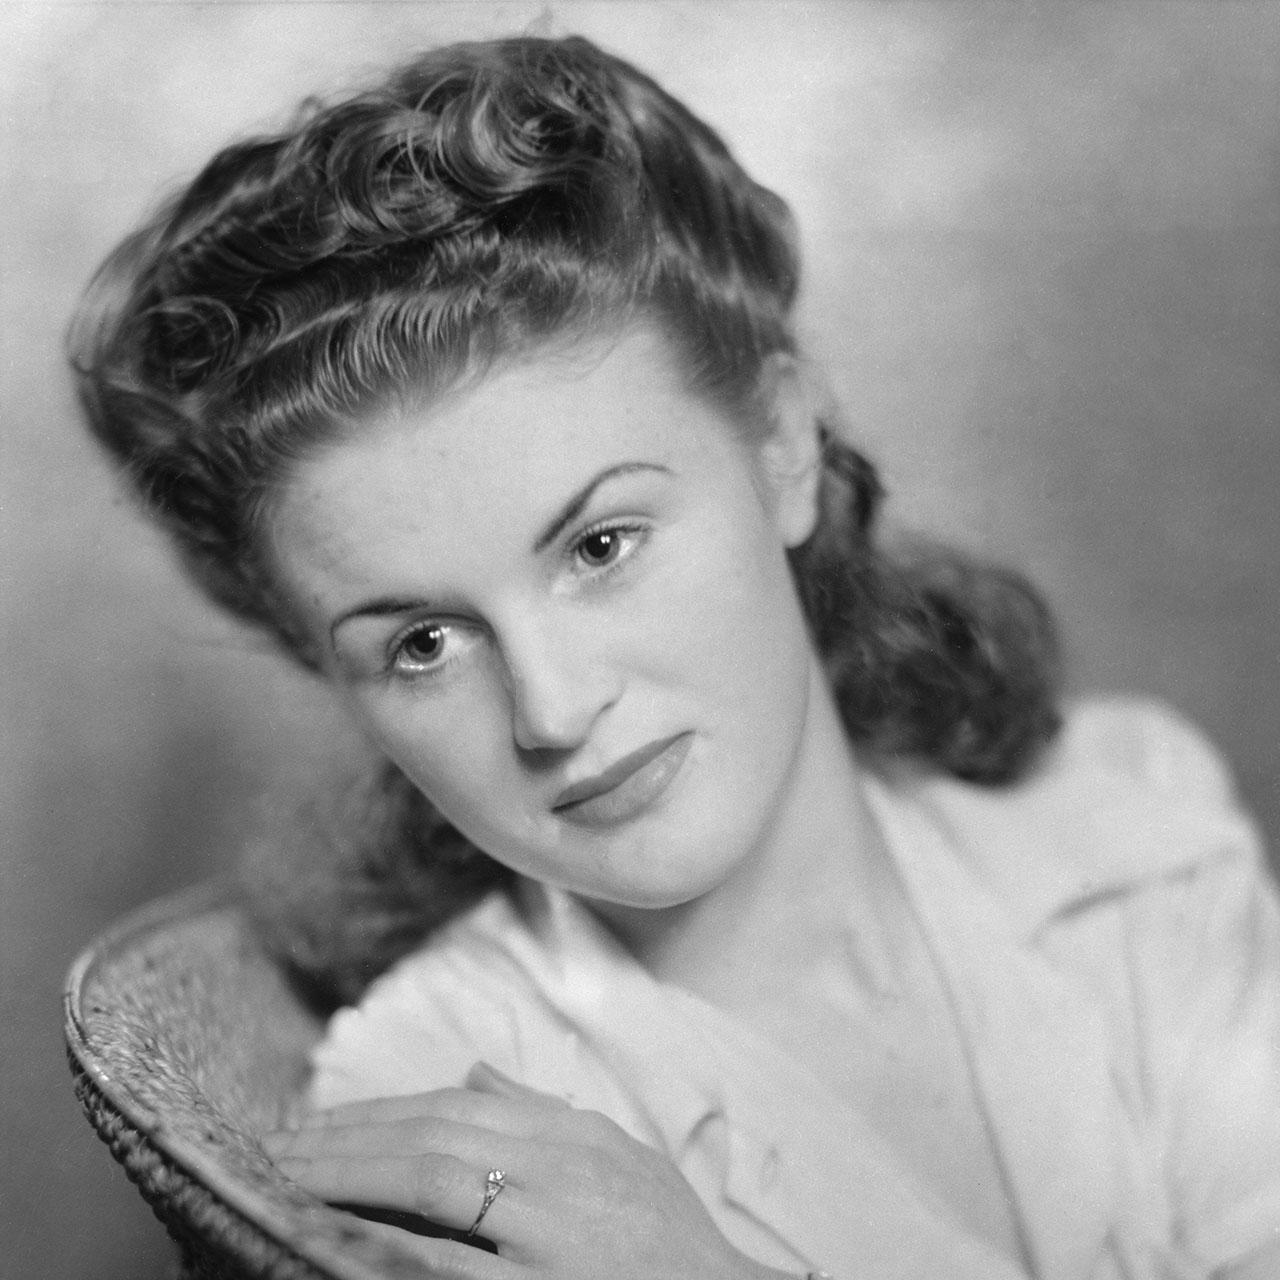 Betty York, fiancée, ca. 1943. (Digital ID: a2391060)